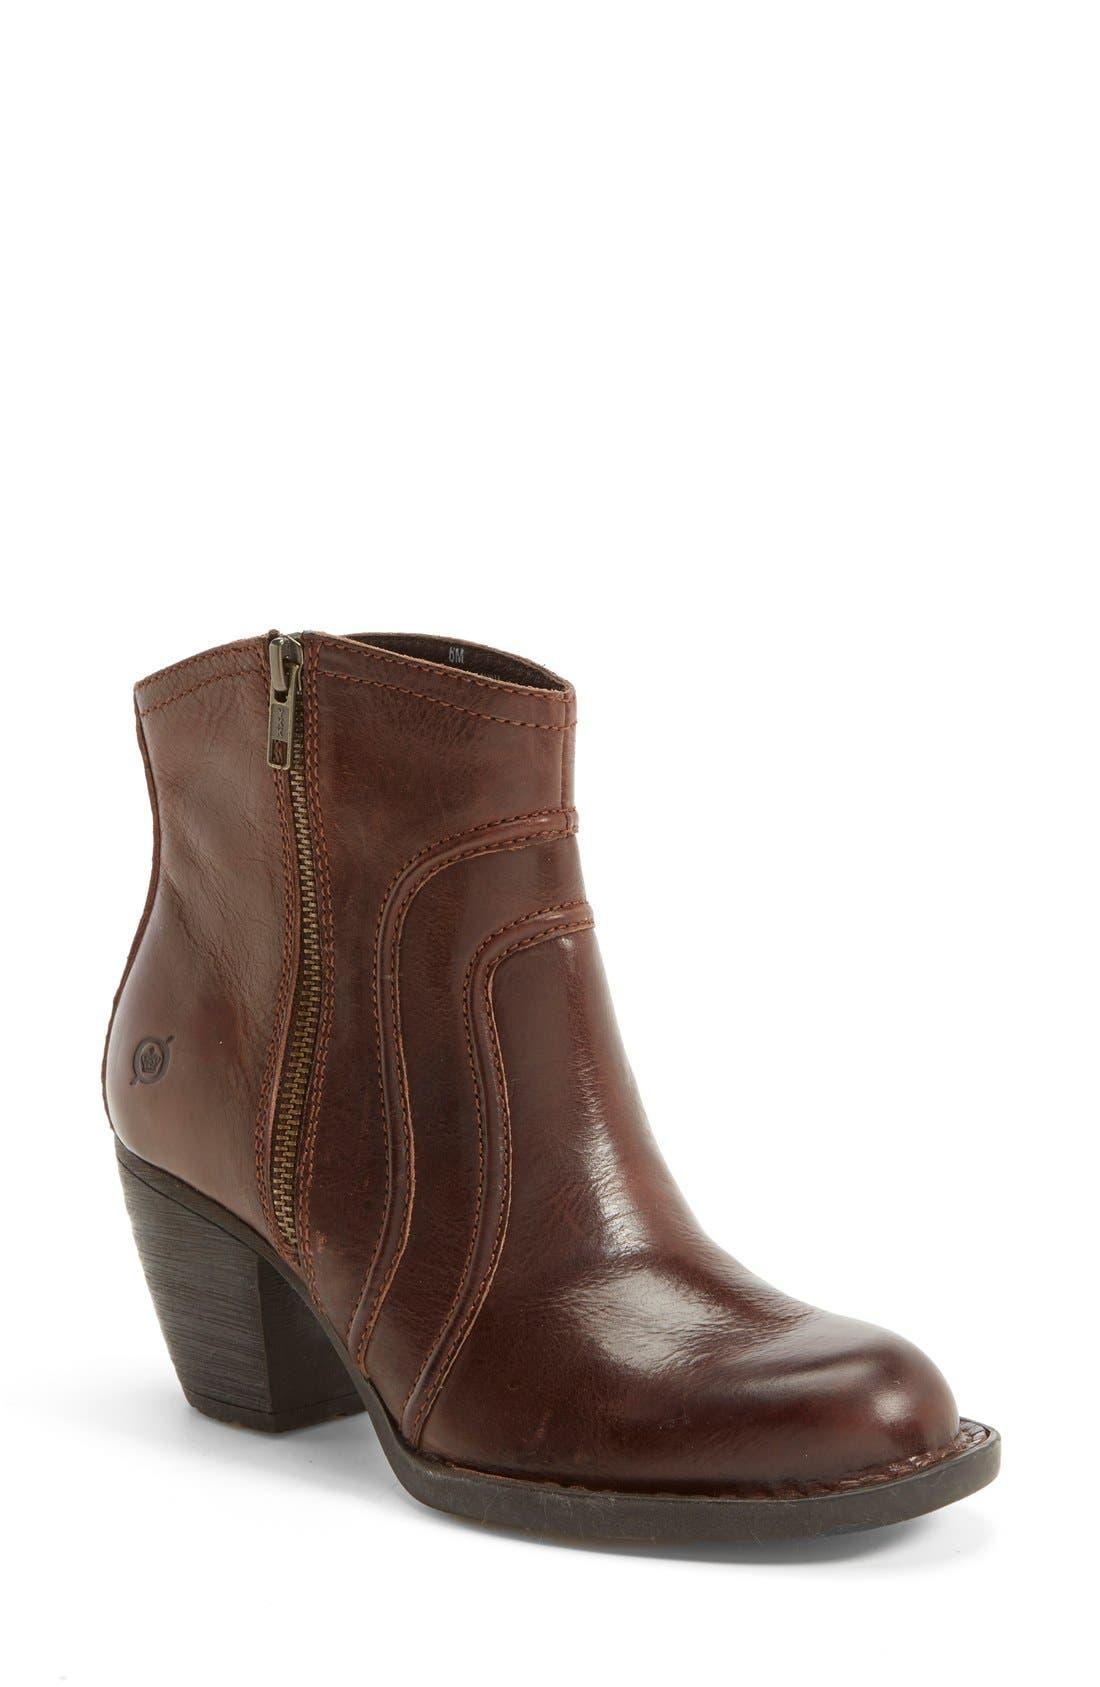 Alternate Image 1 Selected - Børn 'Anny' Boot (Women)